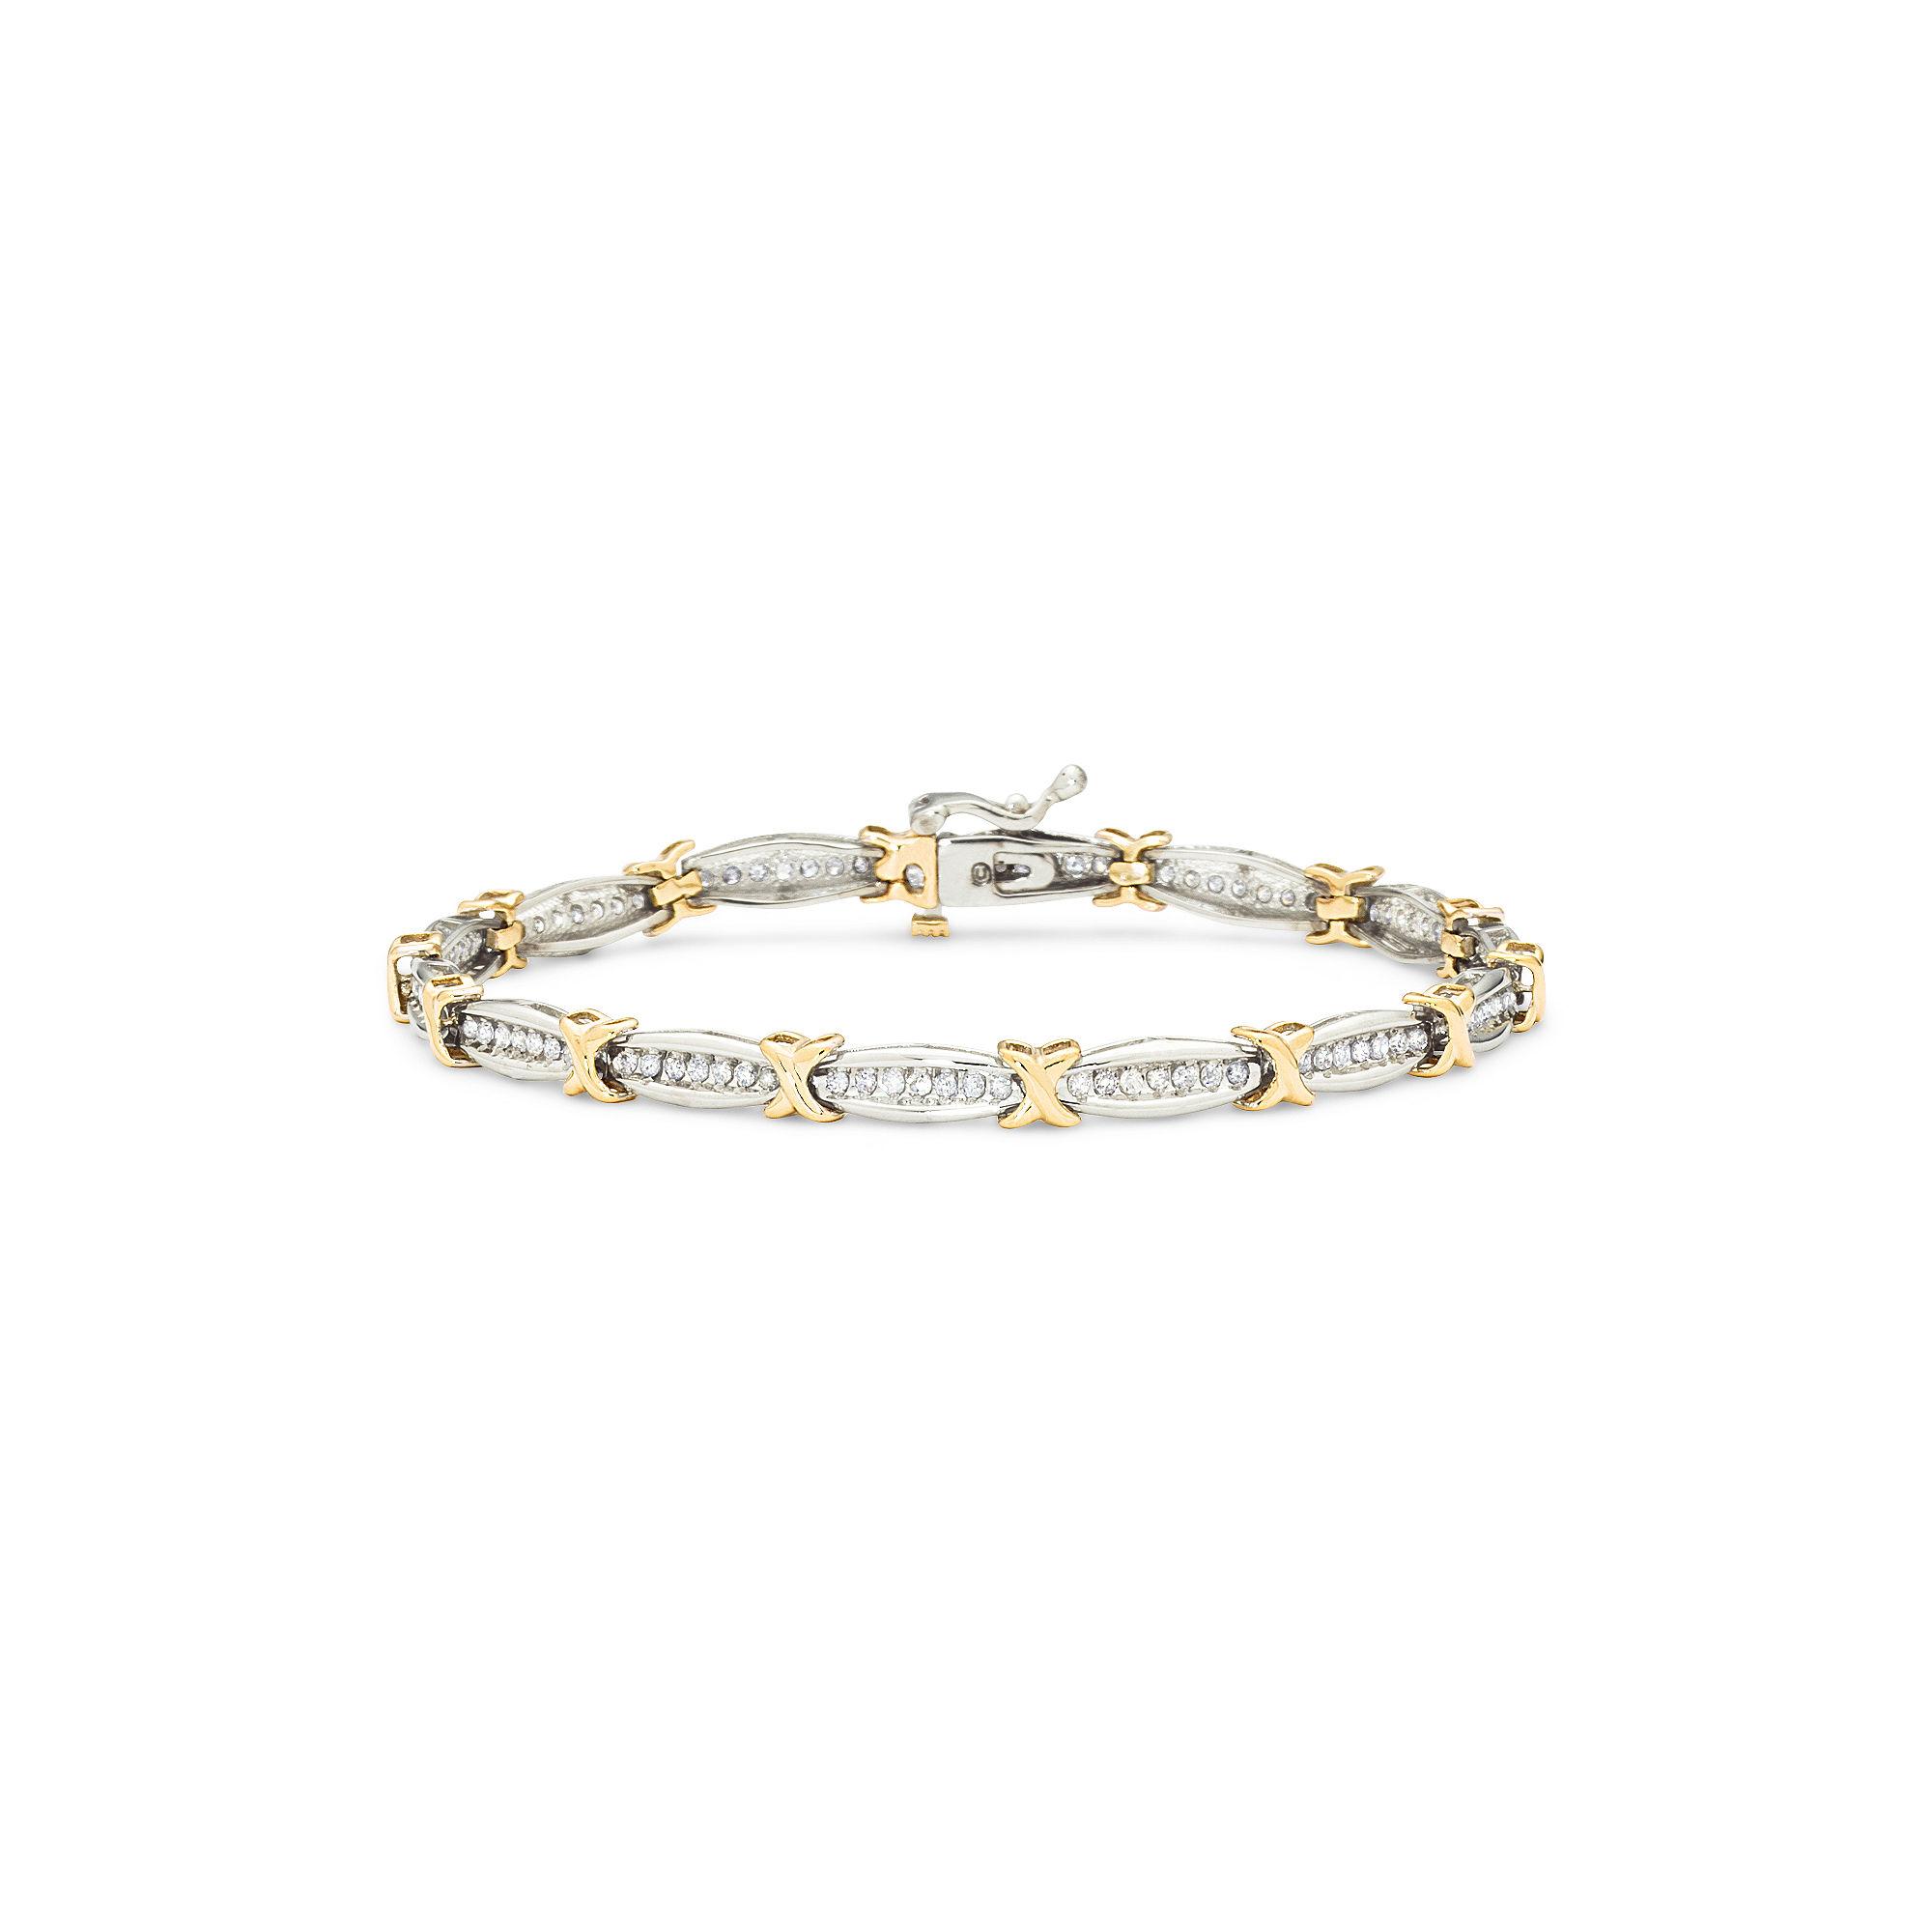 1 CT. T.W. Diamond Tennis Bracelet